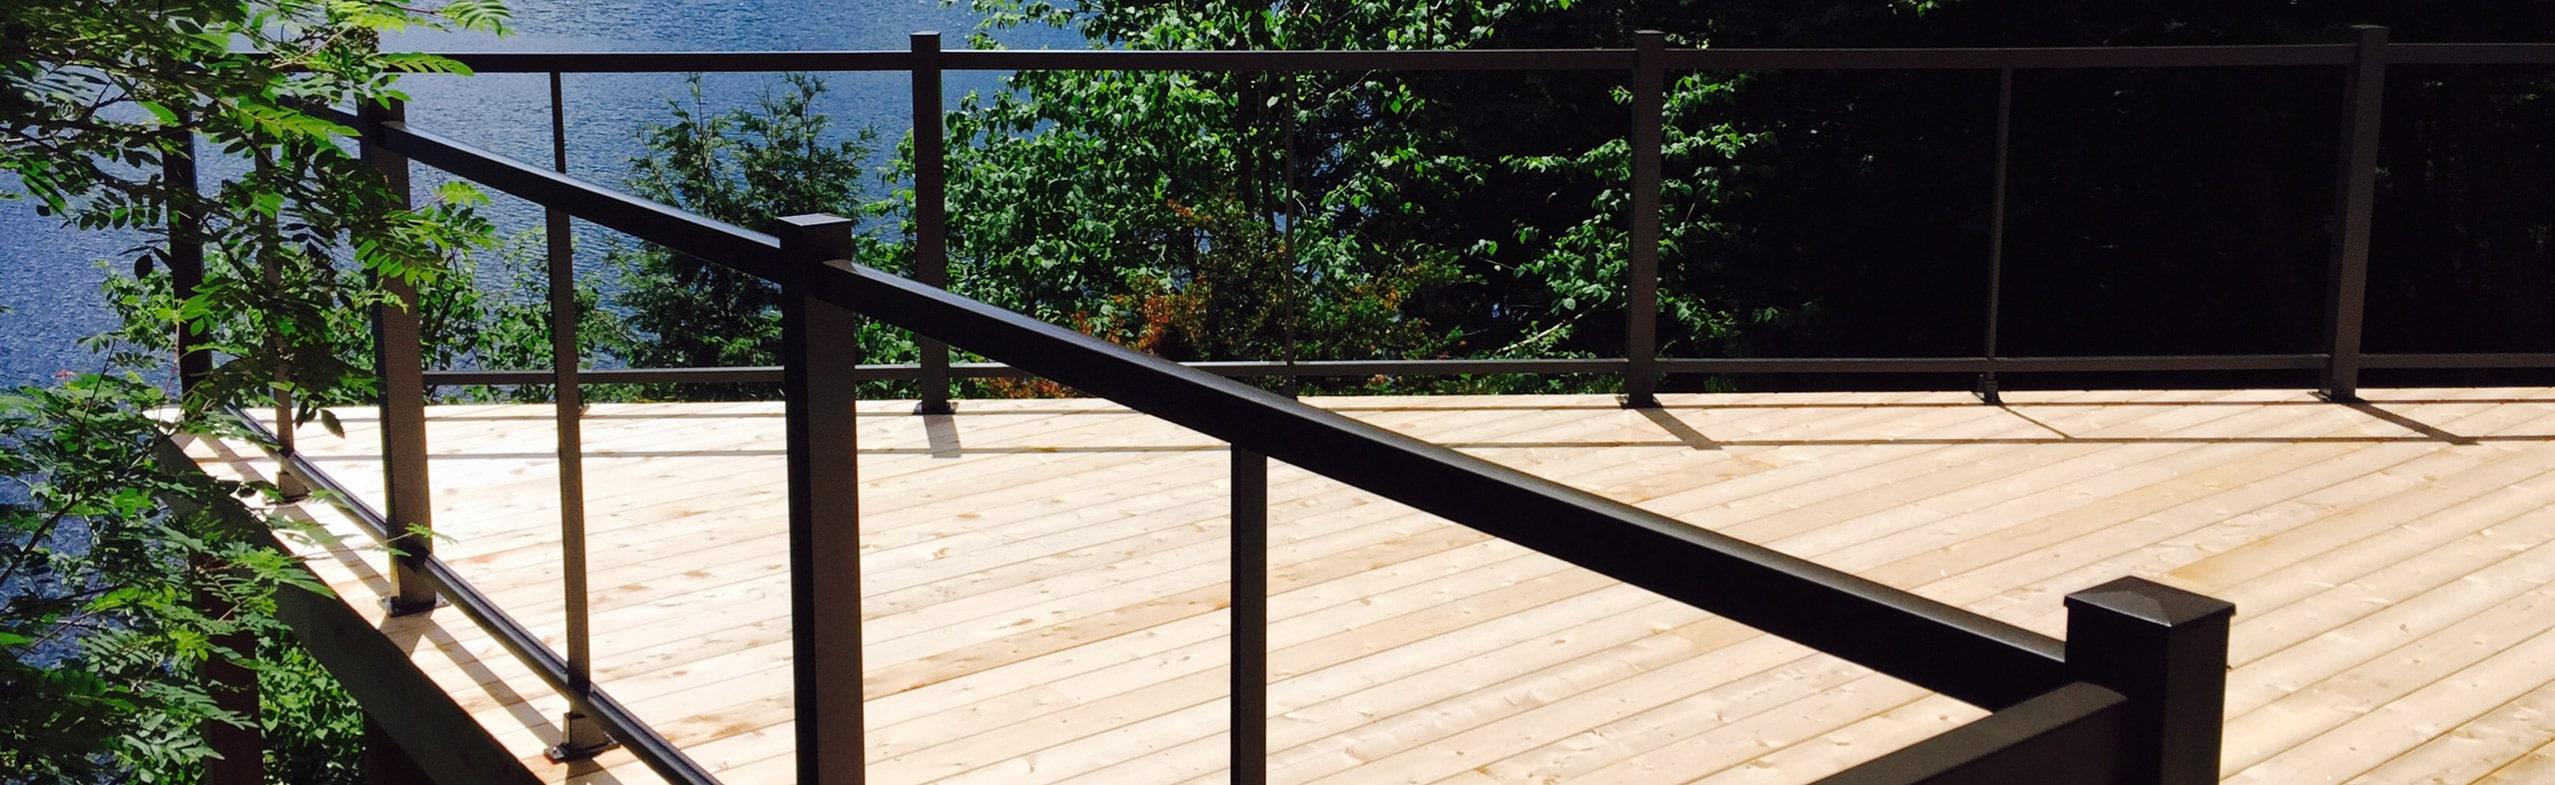 balcon avec rampe en verre et aluminium